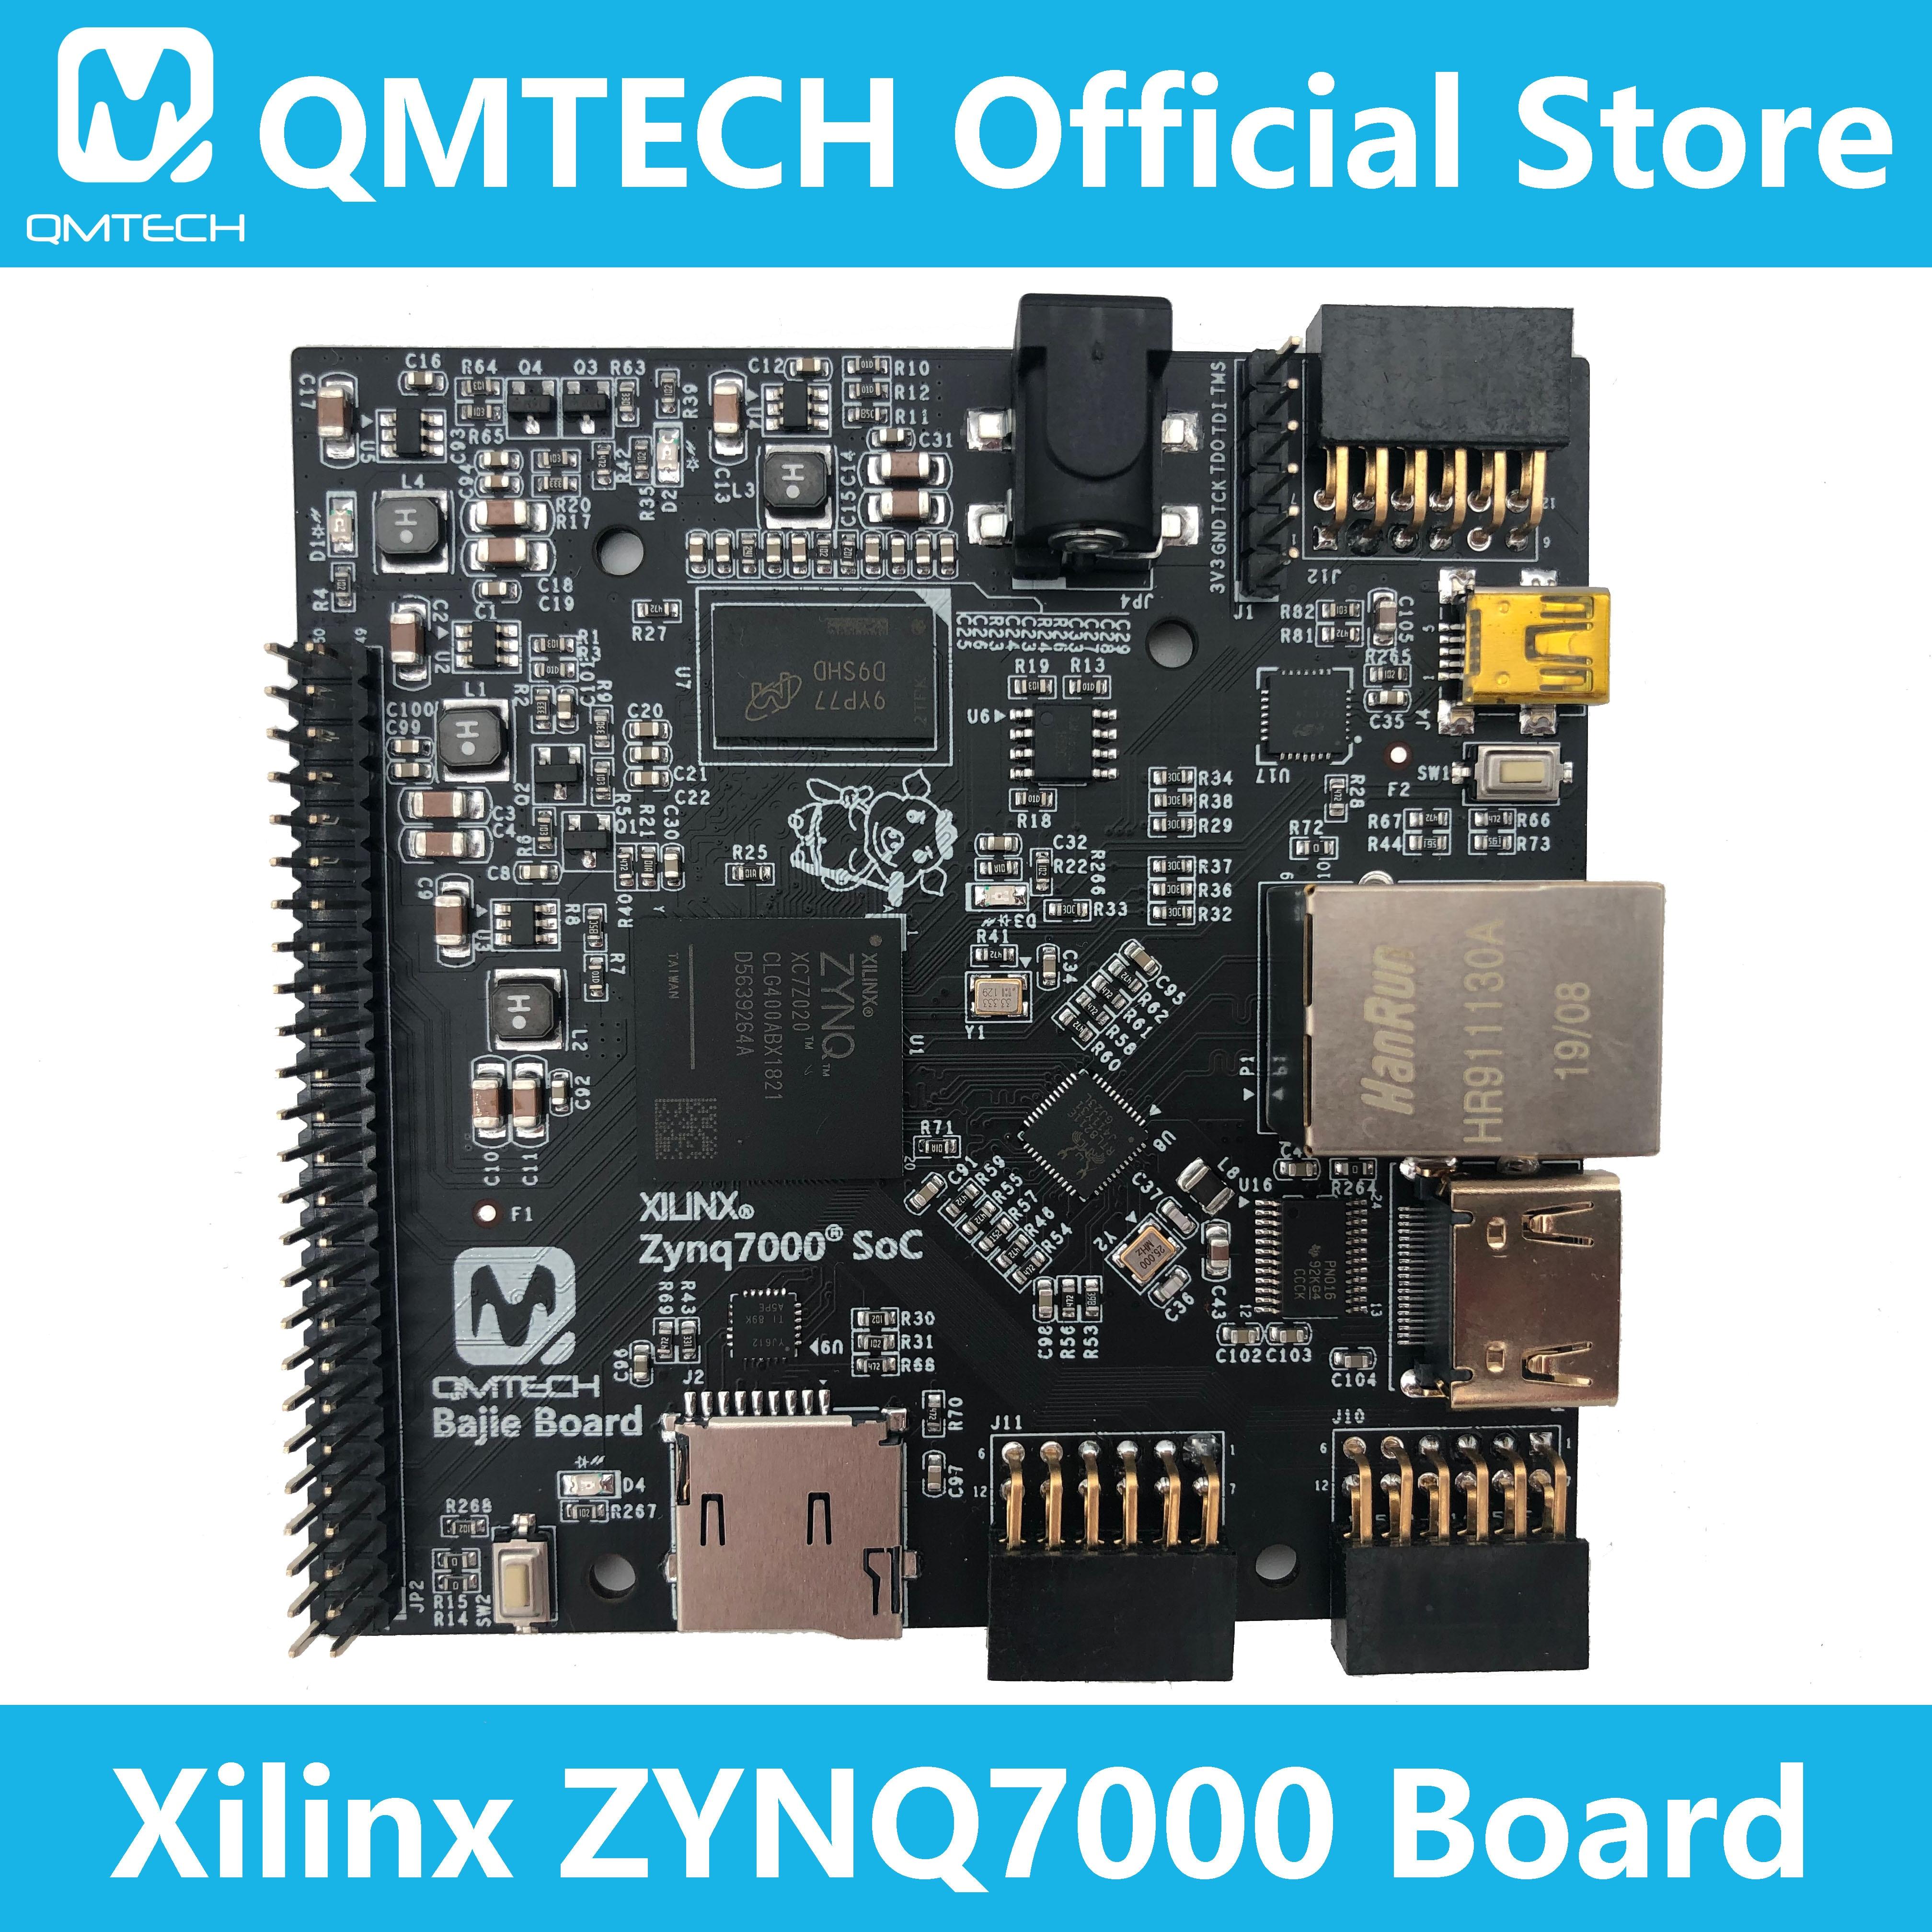 Zynq ZYNQ7000 Zynq-7000 XC7Z020 XC7Z010 Carte de Développement